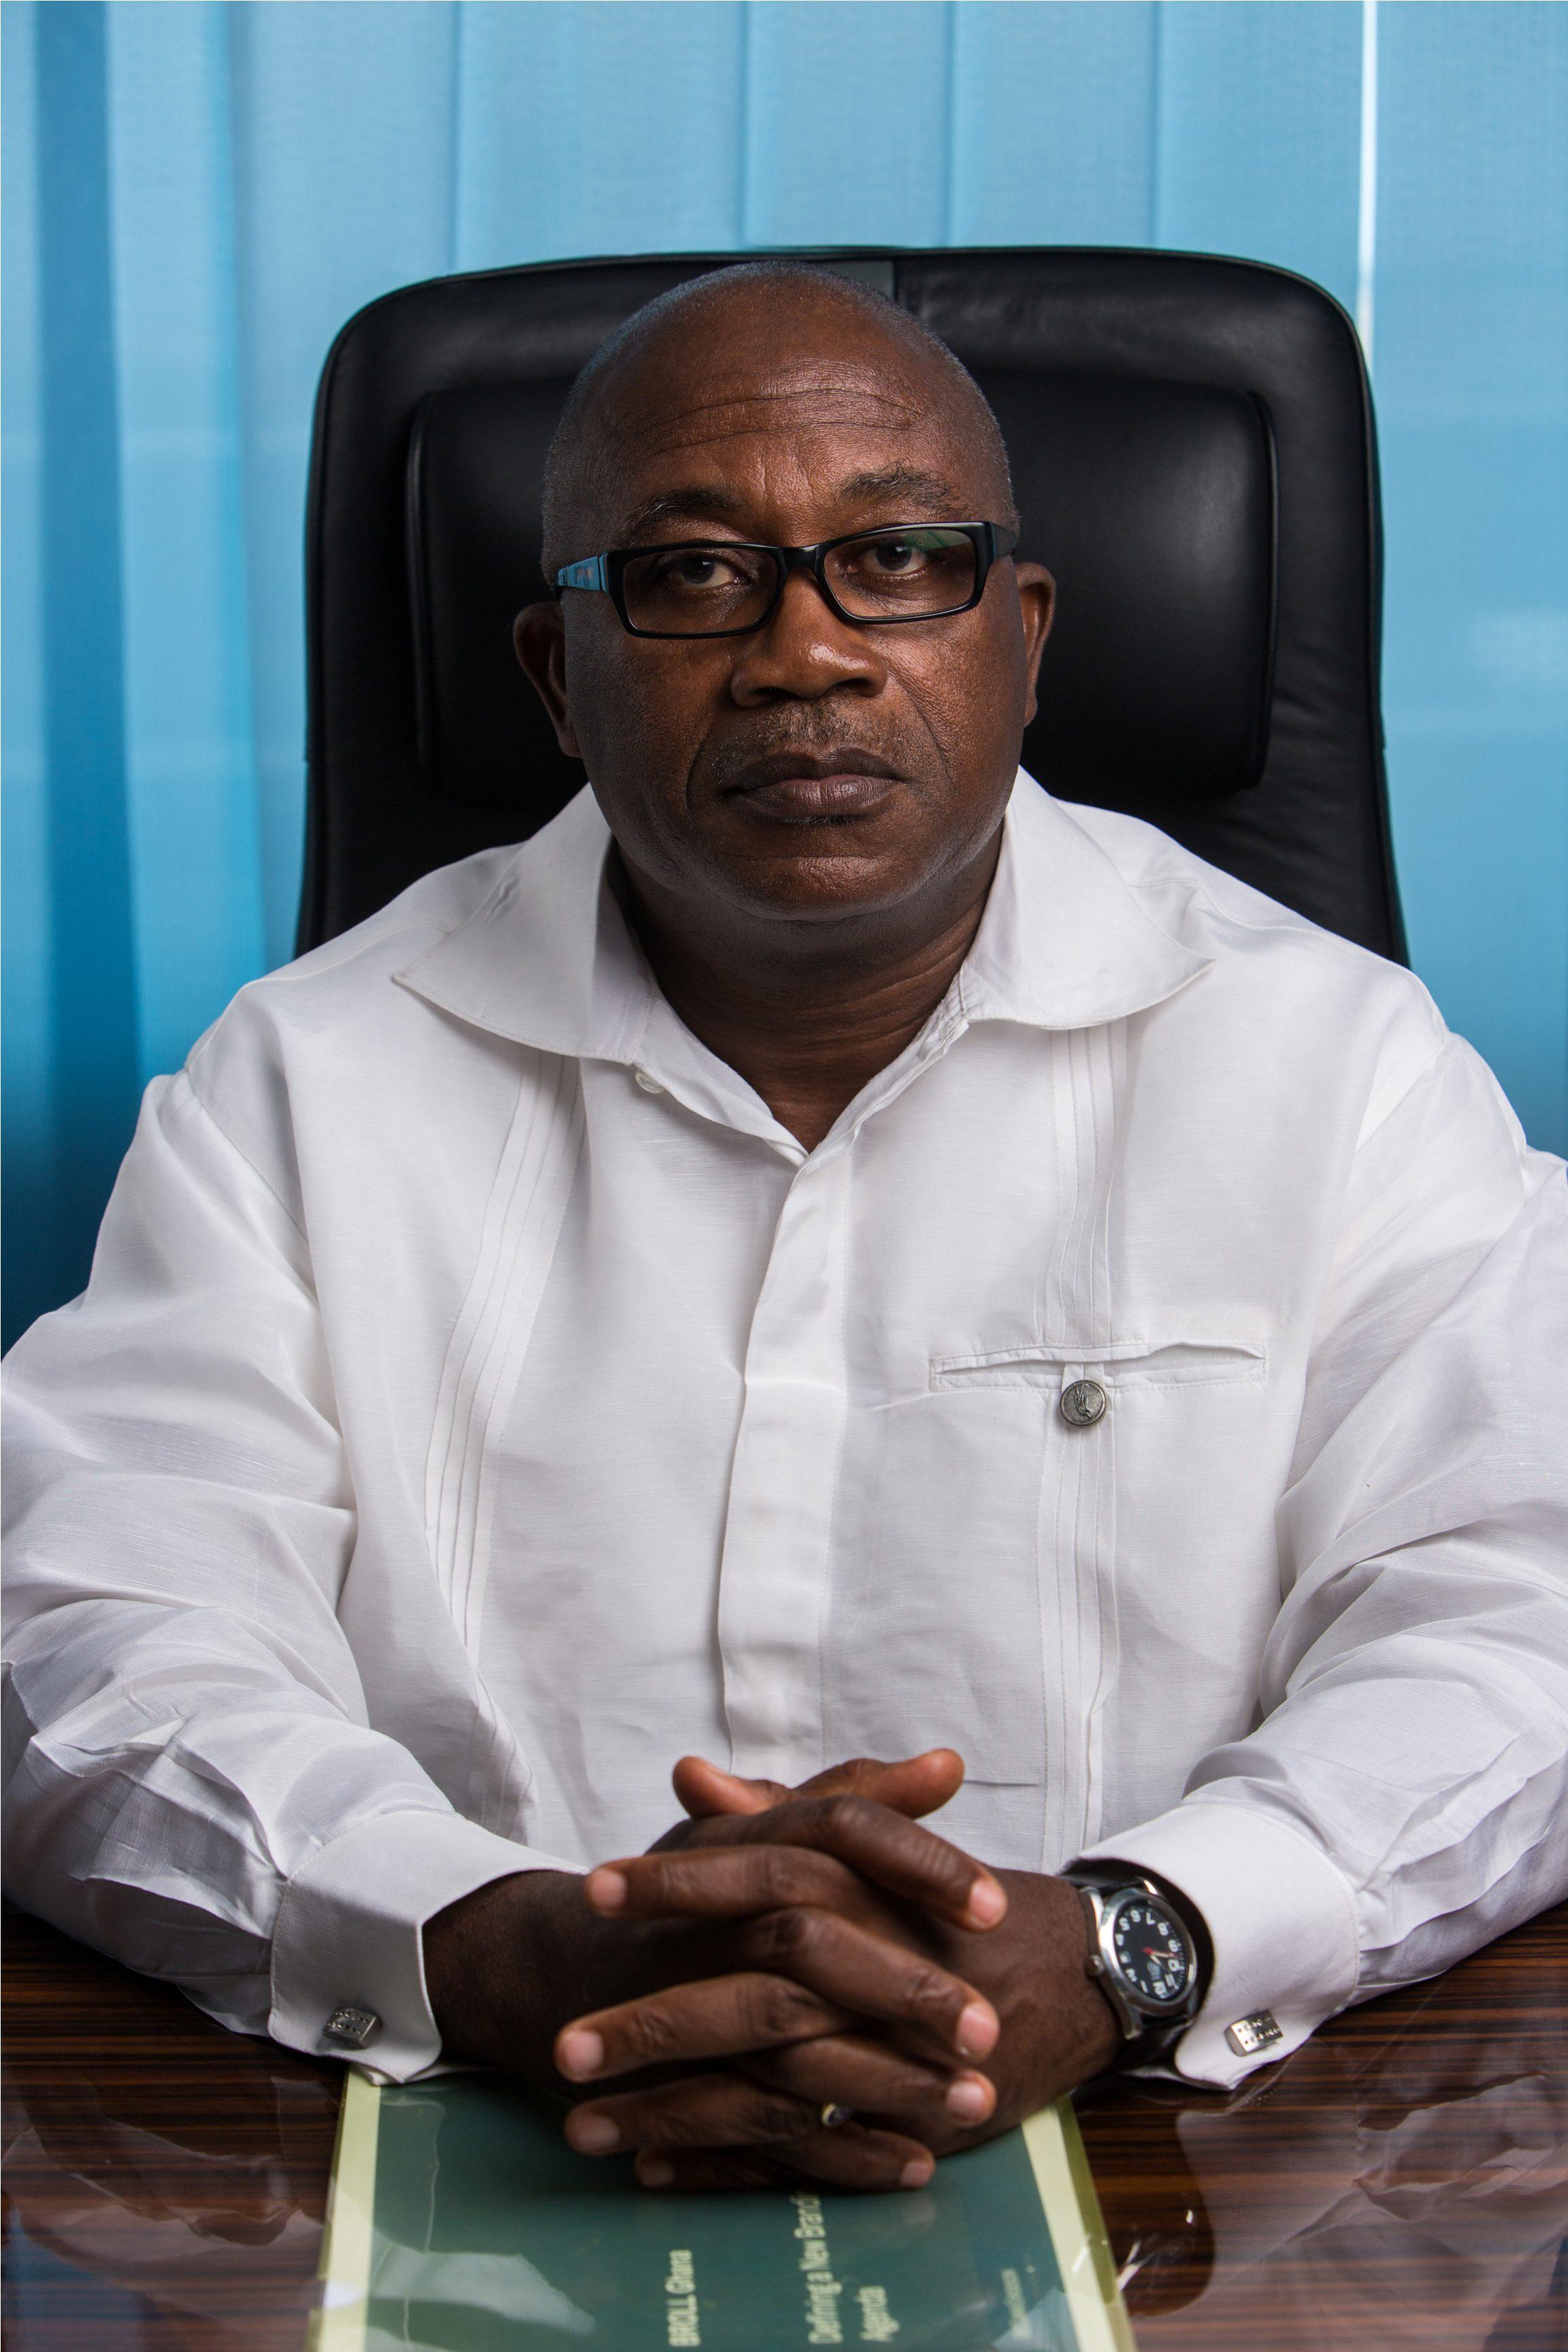 Mr Kofi Ampong, Broll Ghana?s Chief Executive Officer,